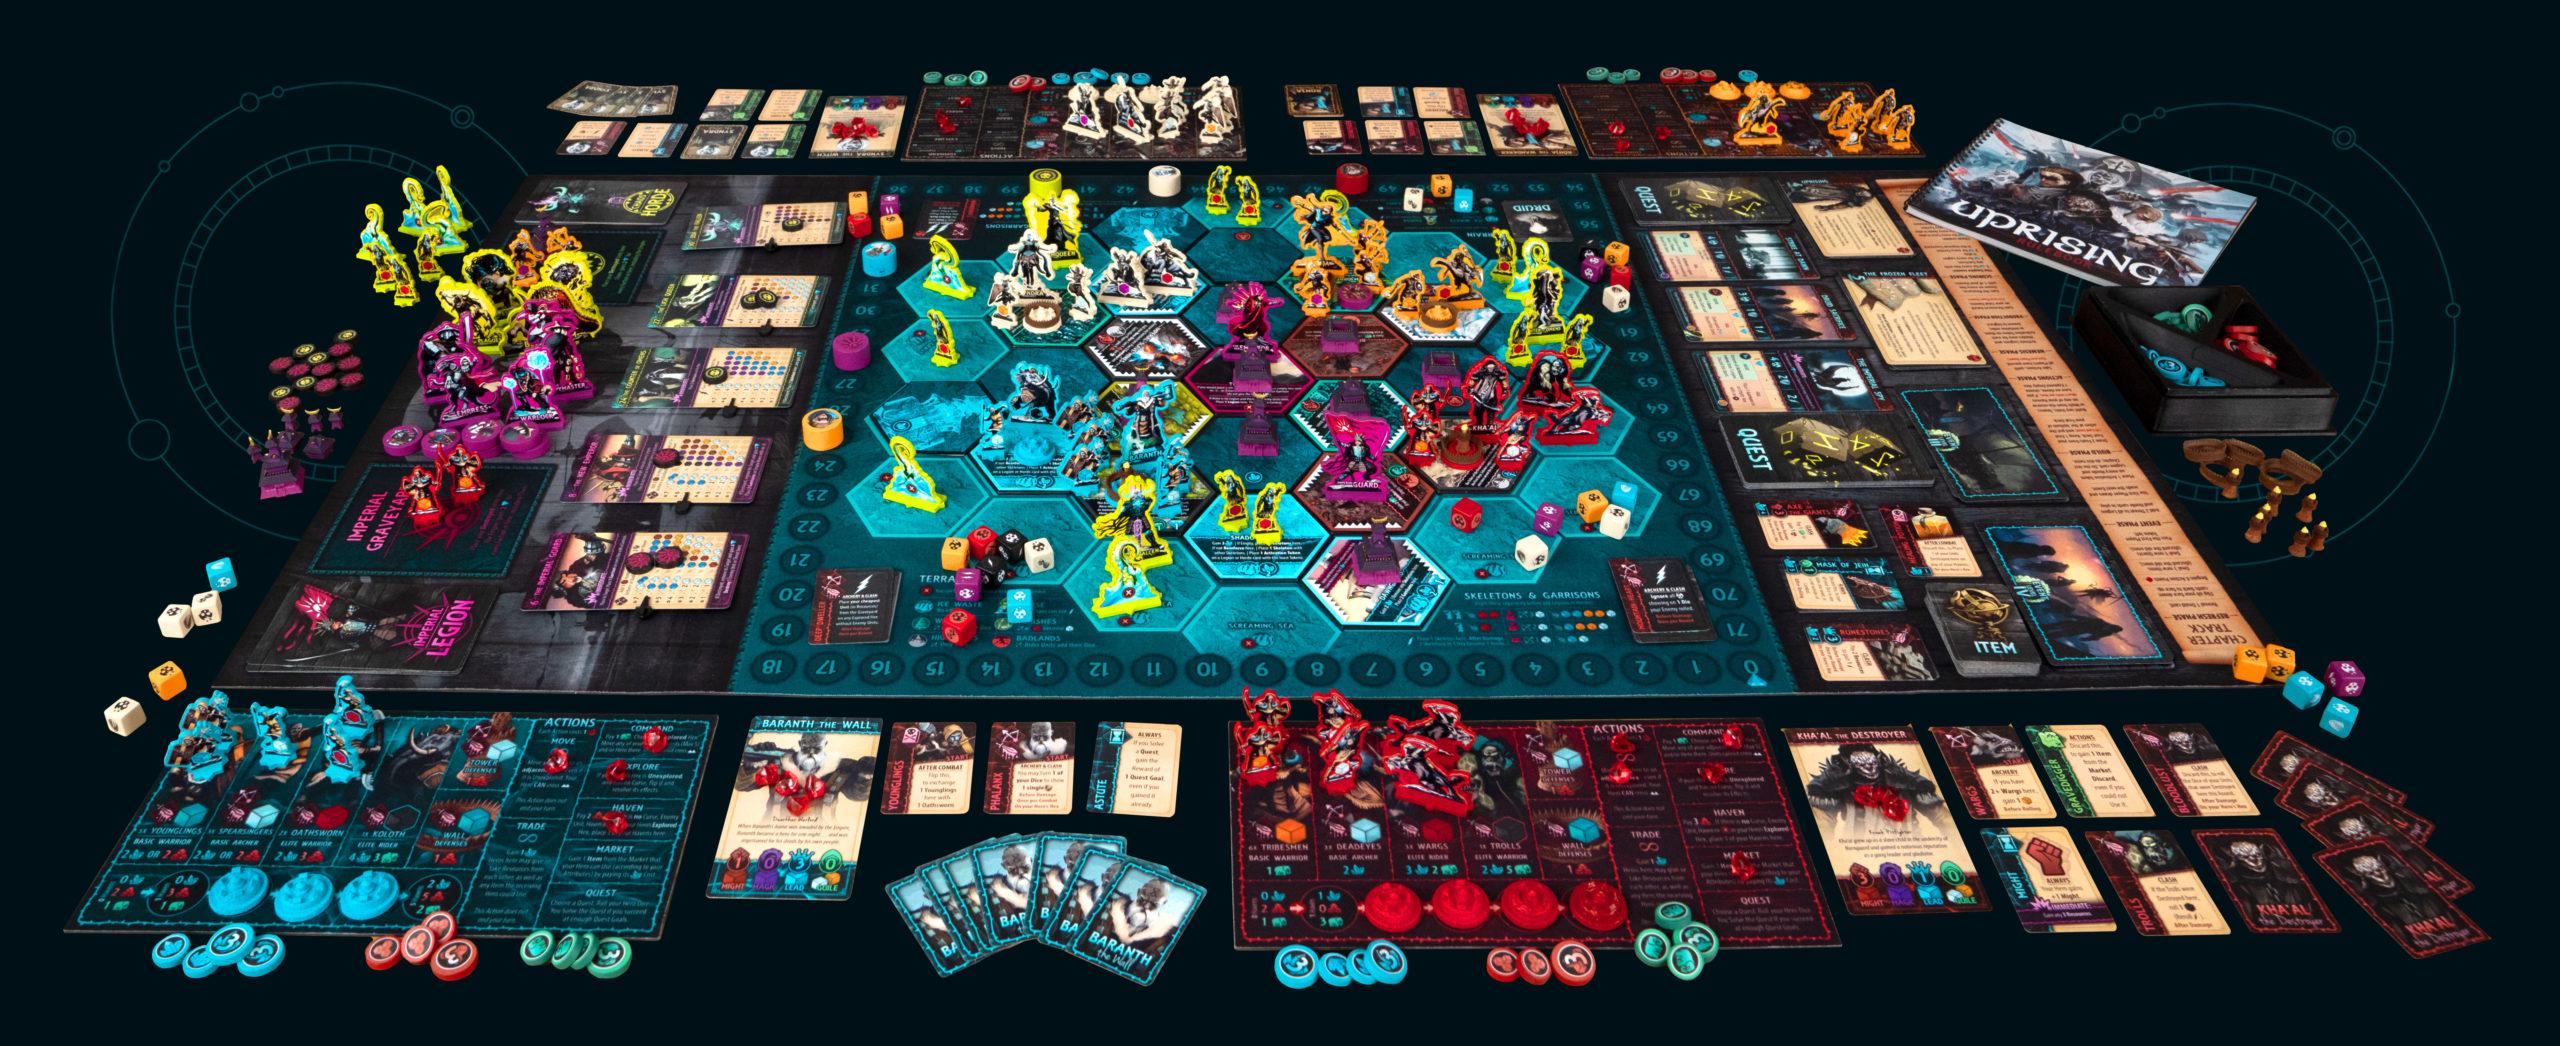 Uprising Full Board